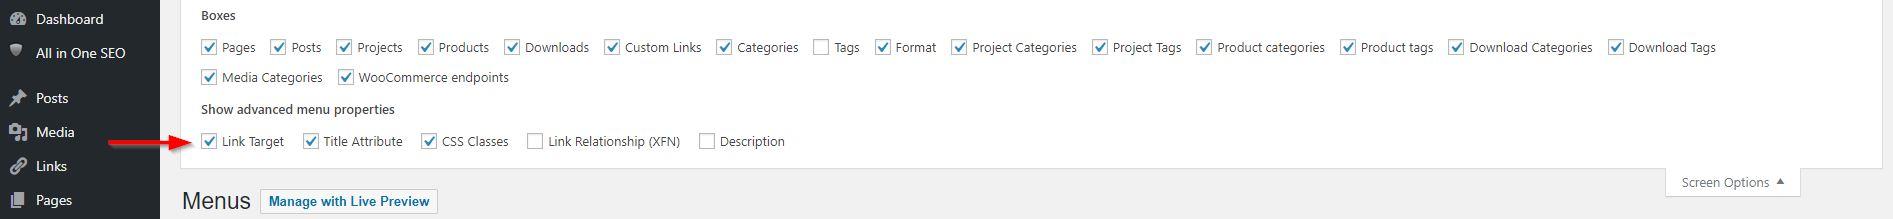 Open Divi menu links in a new window